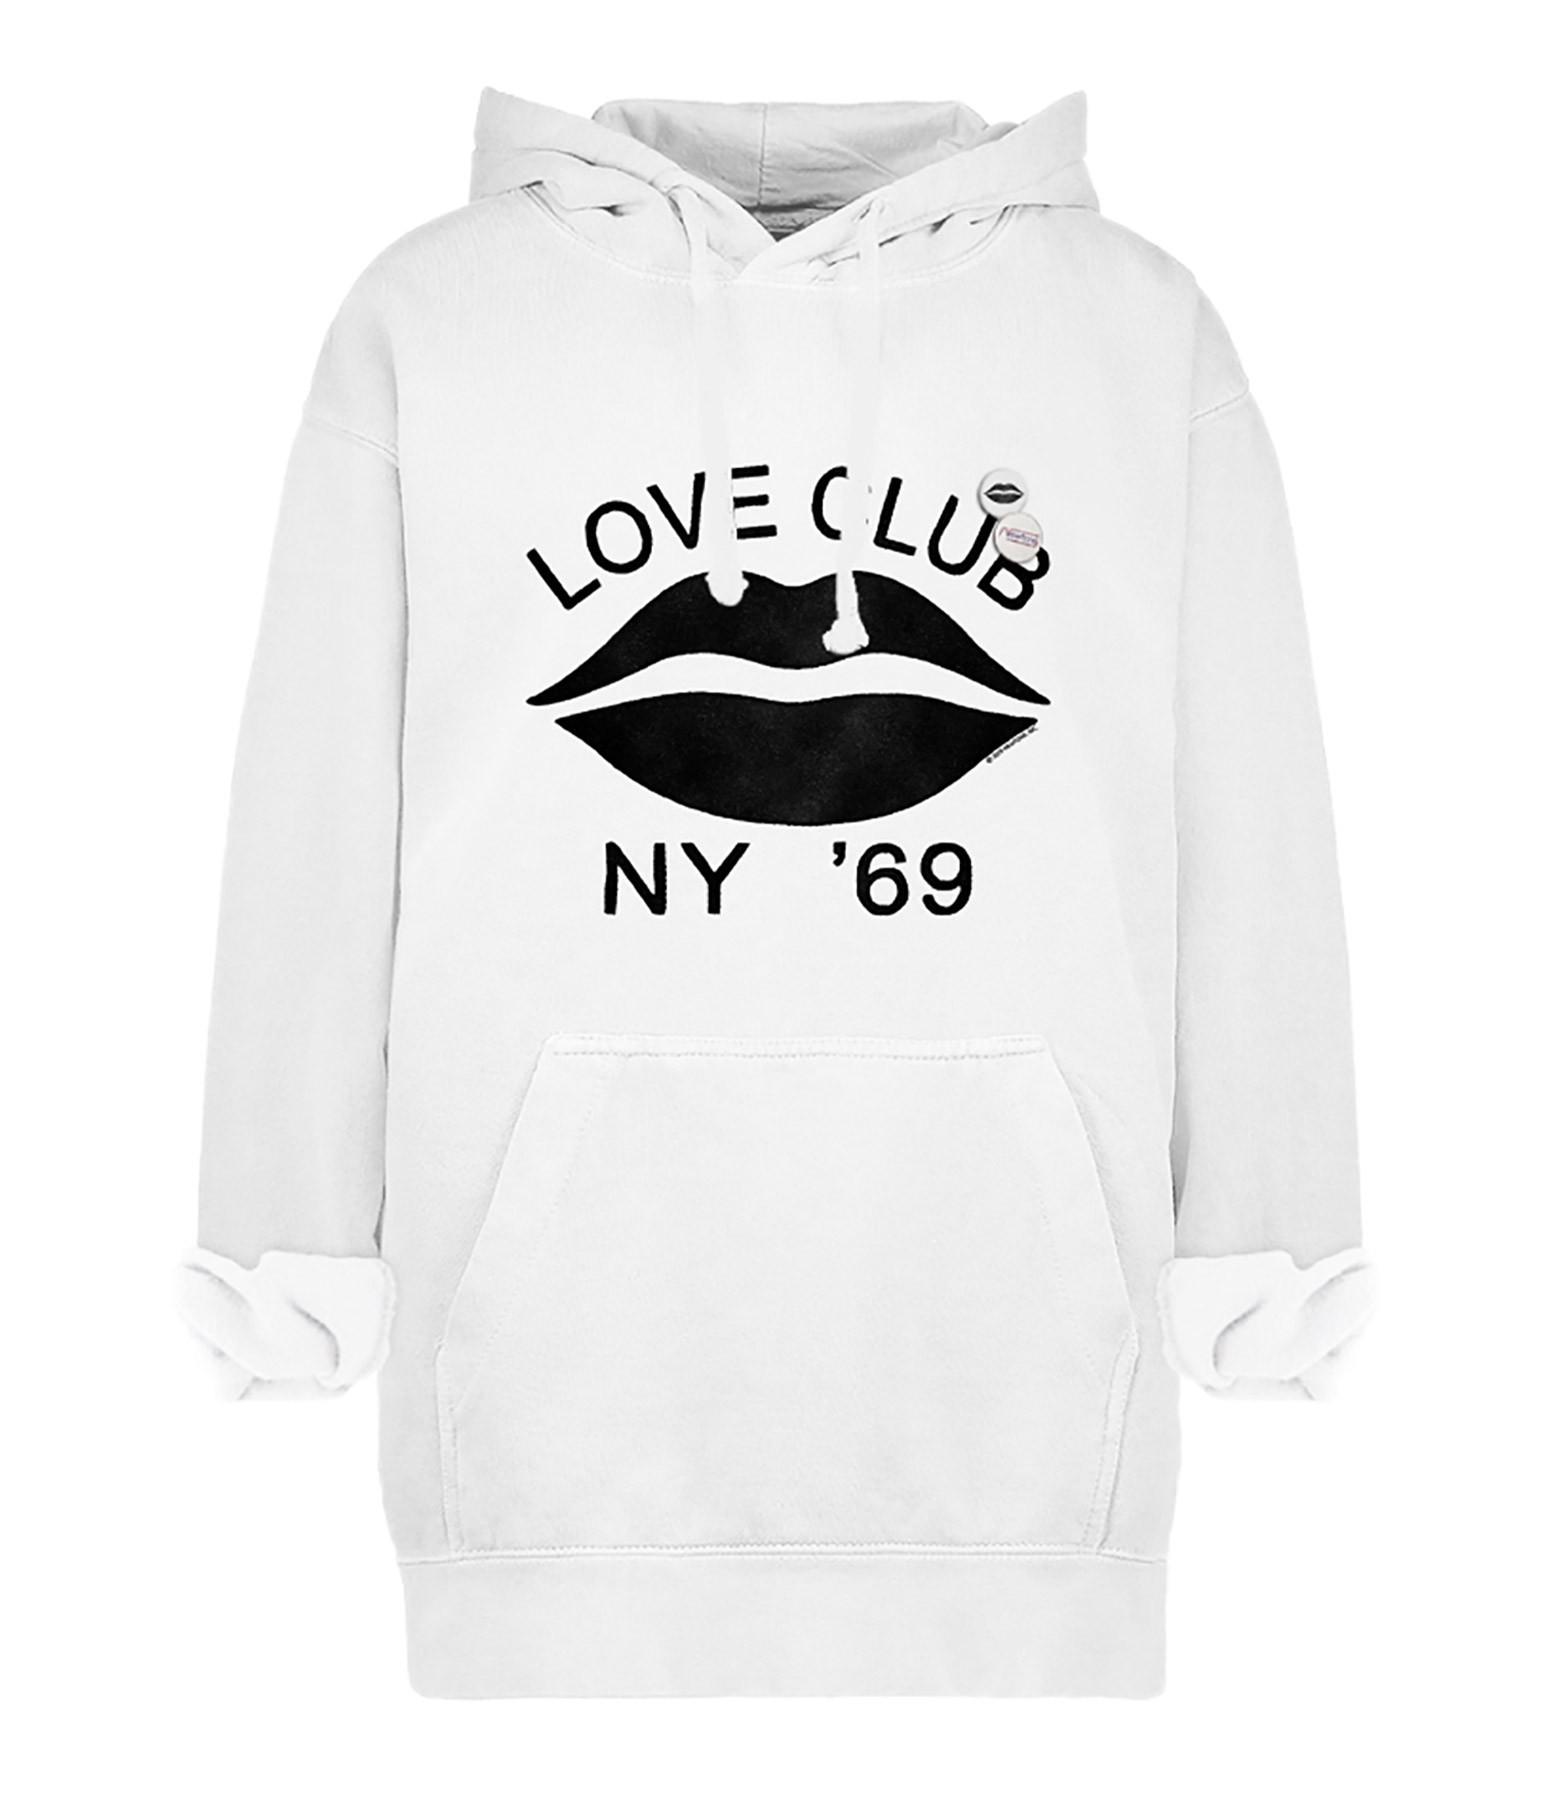 NEWTONE - Sweatshirt Hoodie Love Club Coton Pepper